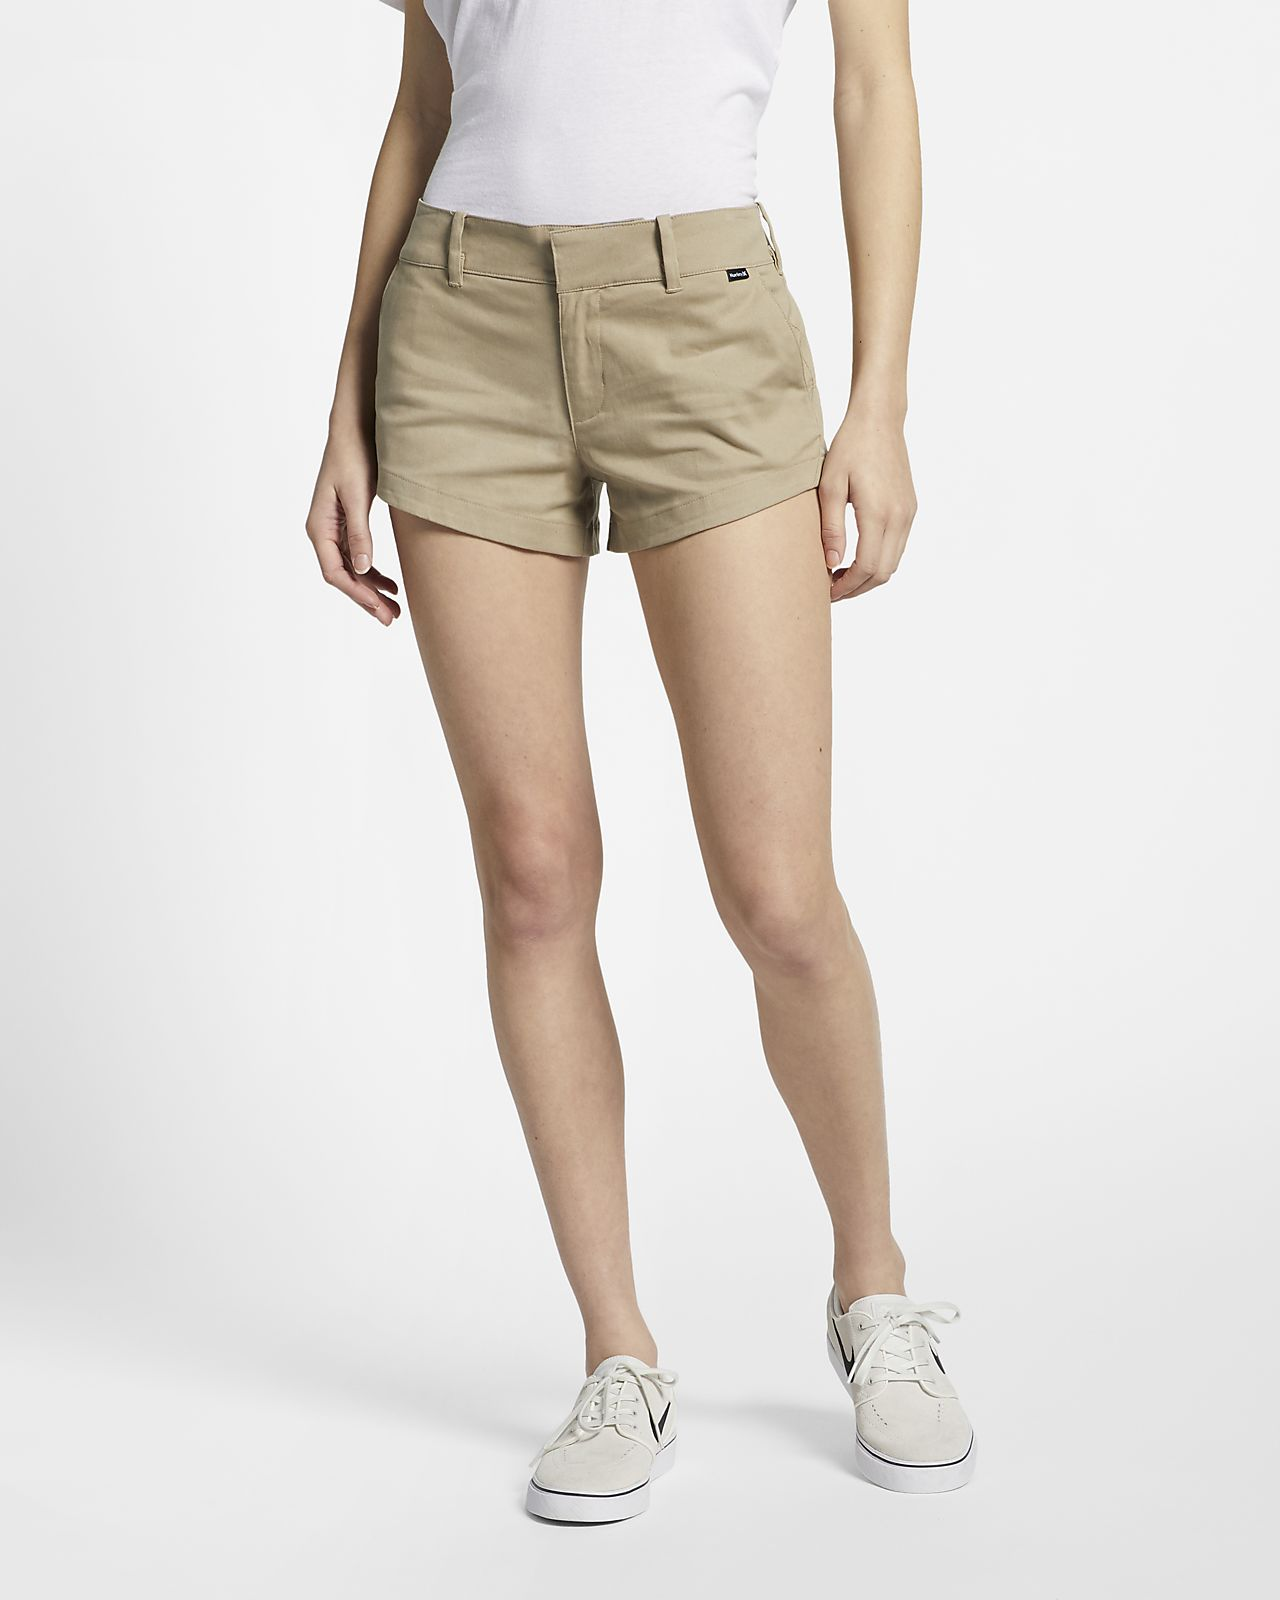 dce802e2 Shorts para mujer Chino Hurley Lowrider. Nike.com MX